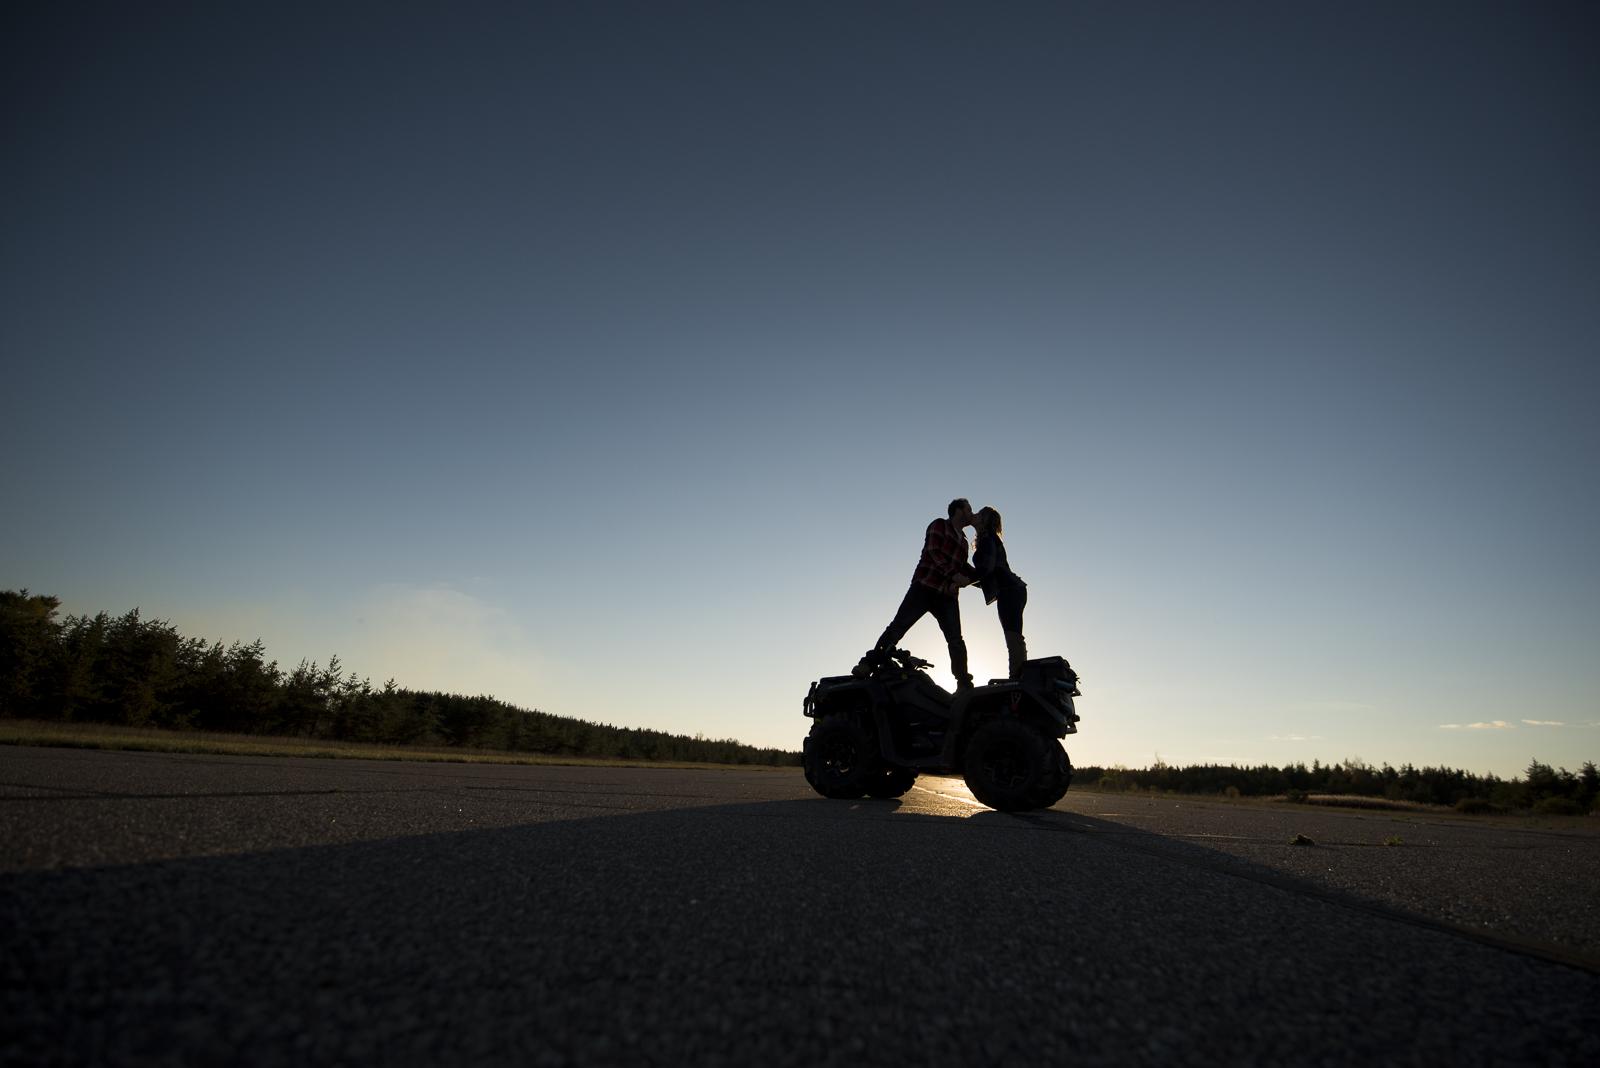 Engagement_Photography_Dan_Garrity_Media_Thunder_Bay13